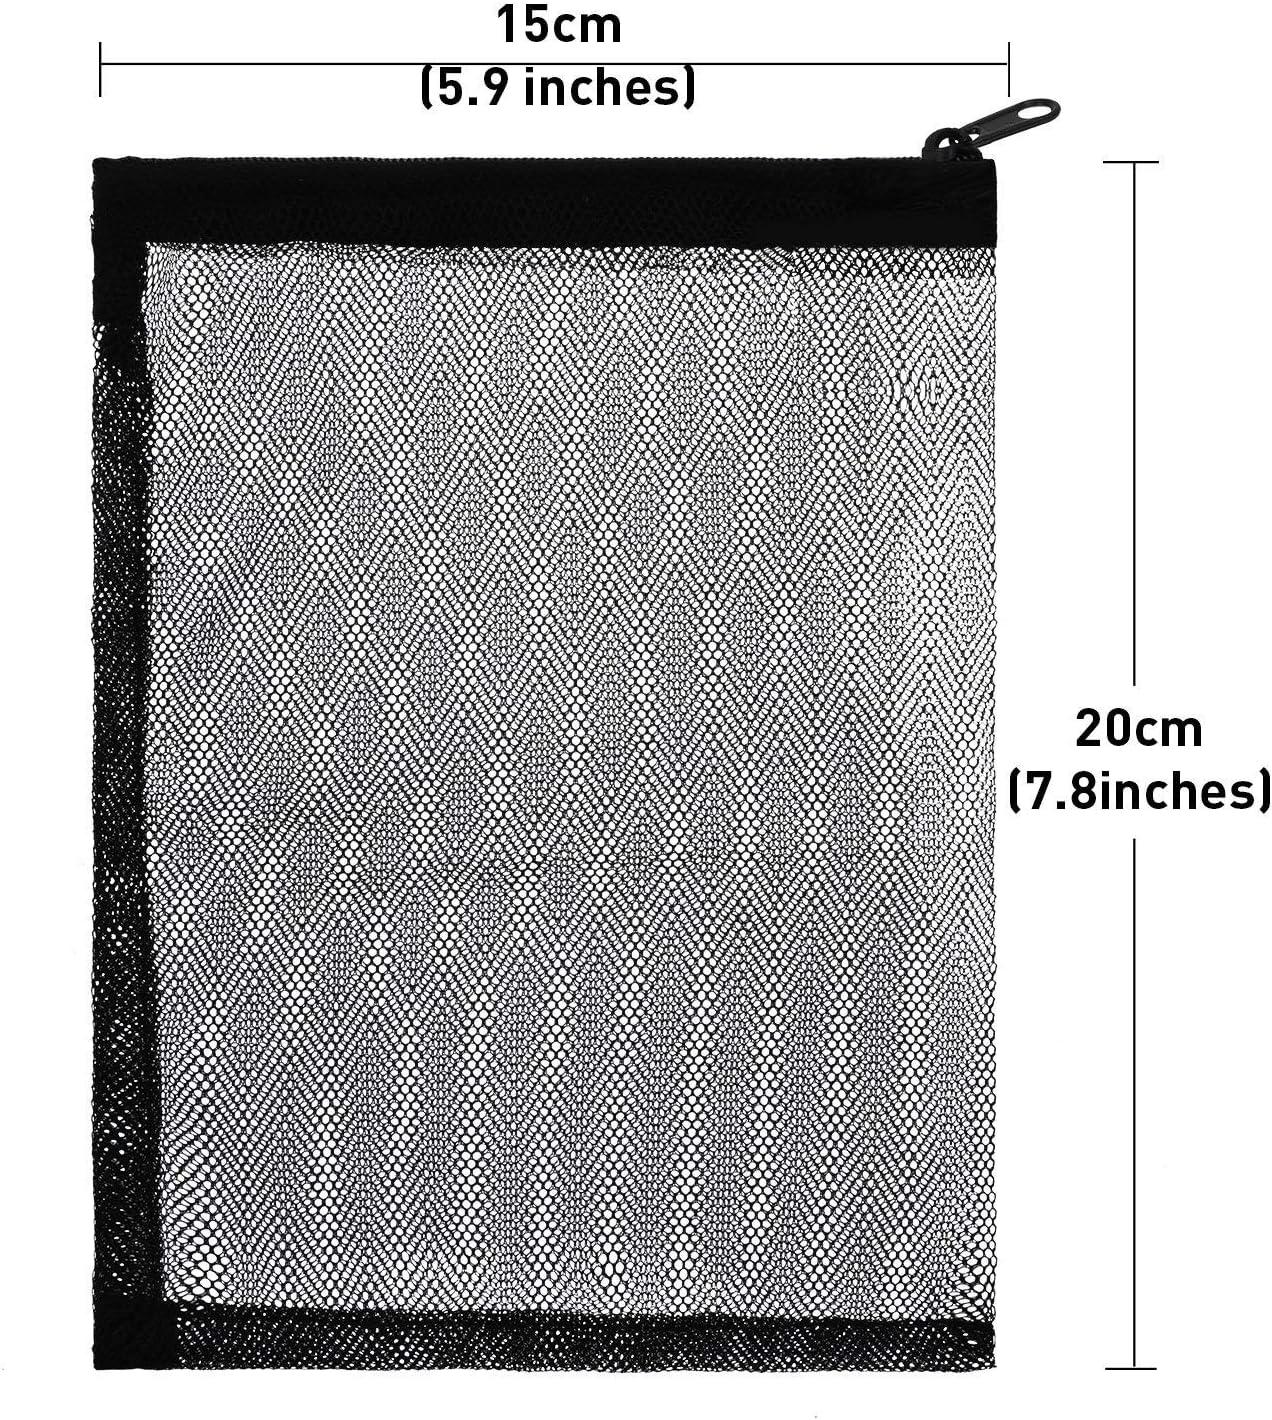 Yoogeer 20Pcs Filter Media Bags 20 x 15cm Reusable Aquarium Fish Tank Pond Net Mesh Bag,10x Black,10x White